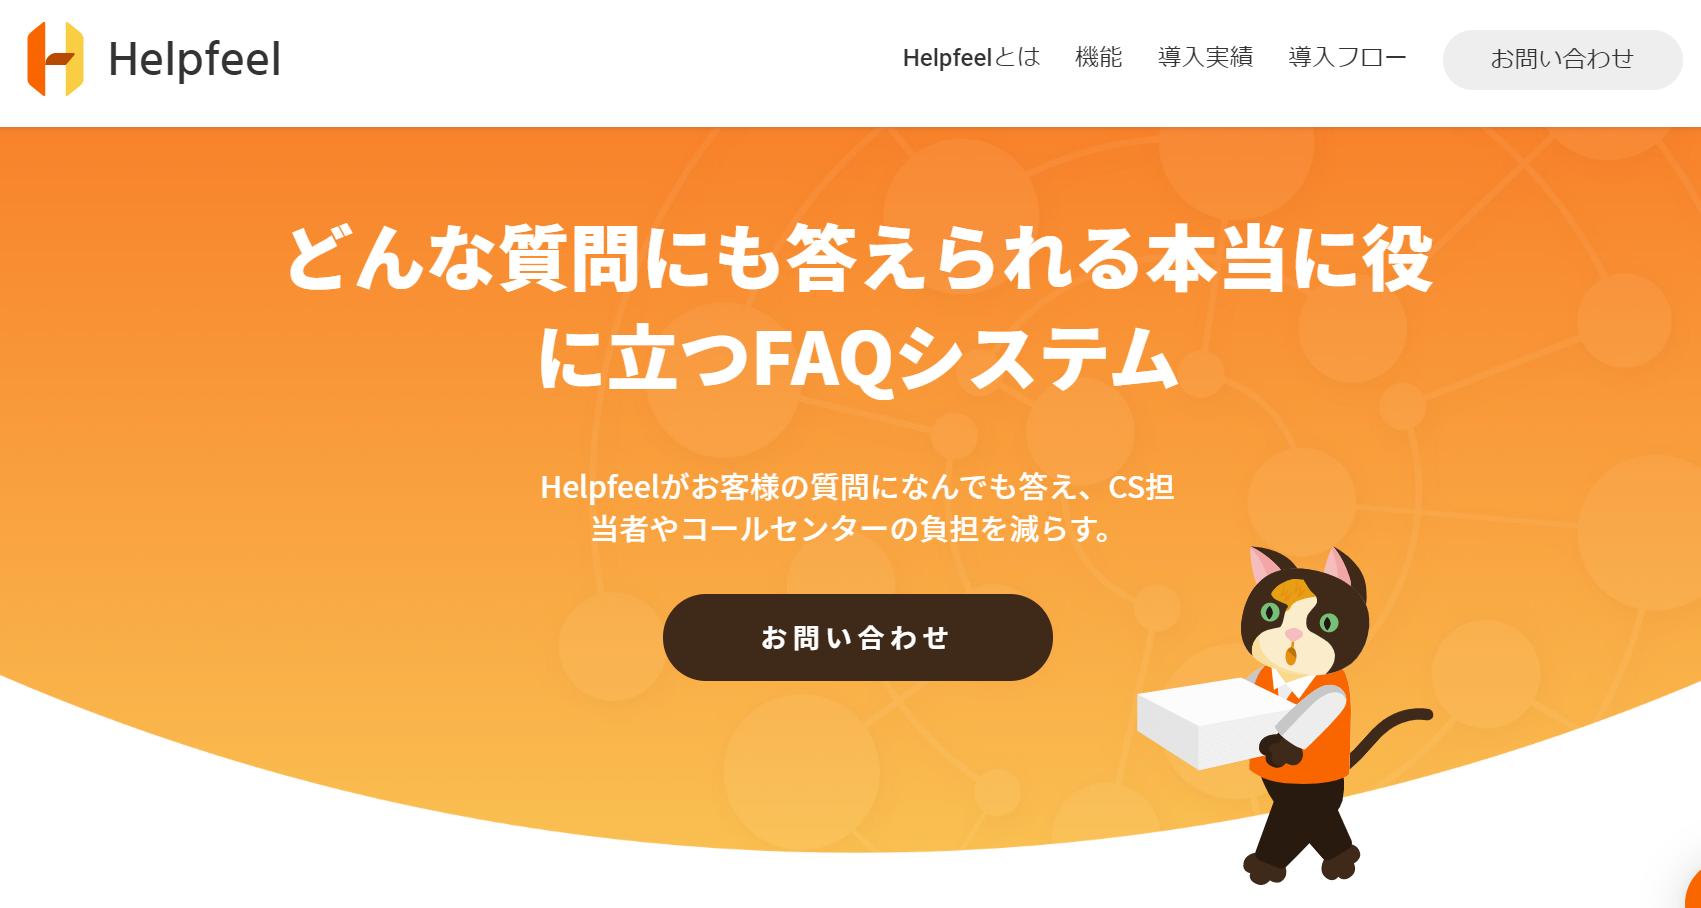 Helpfeel公式Webサイト